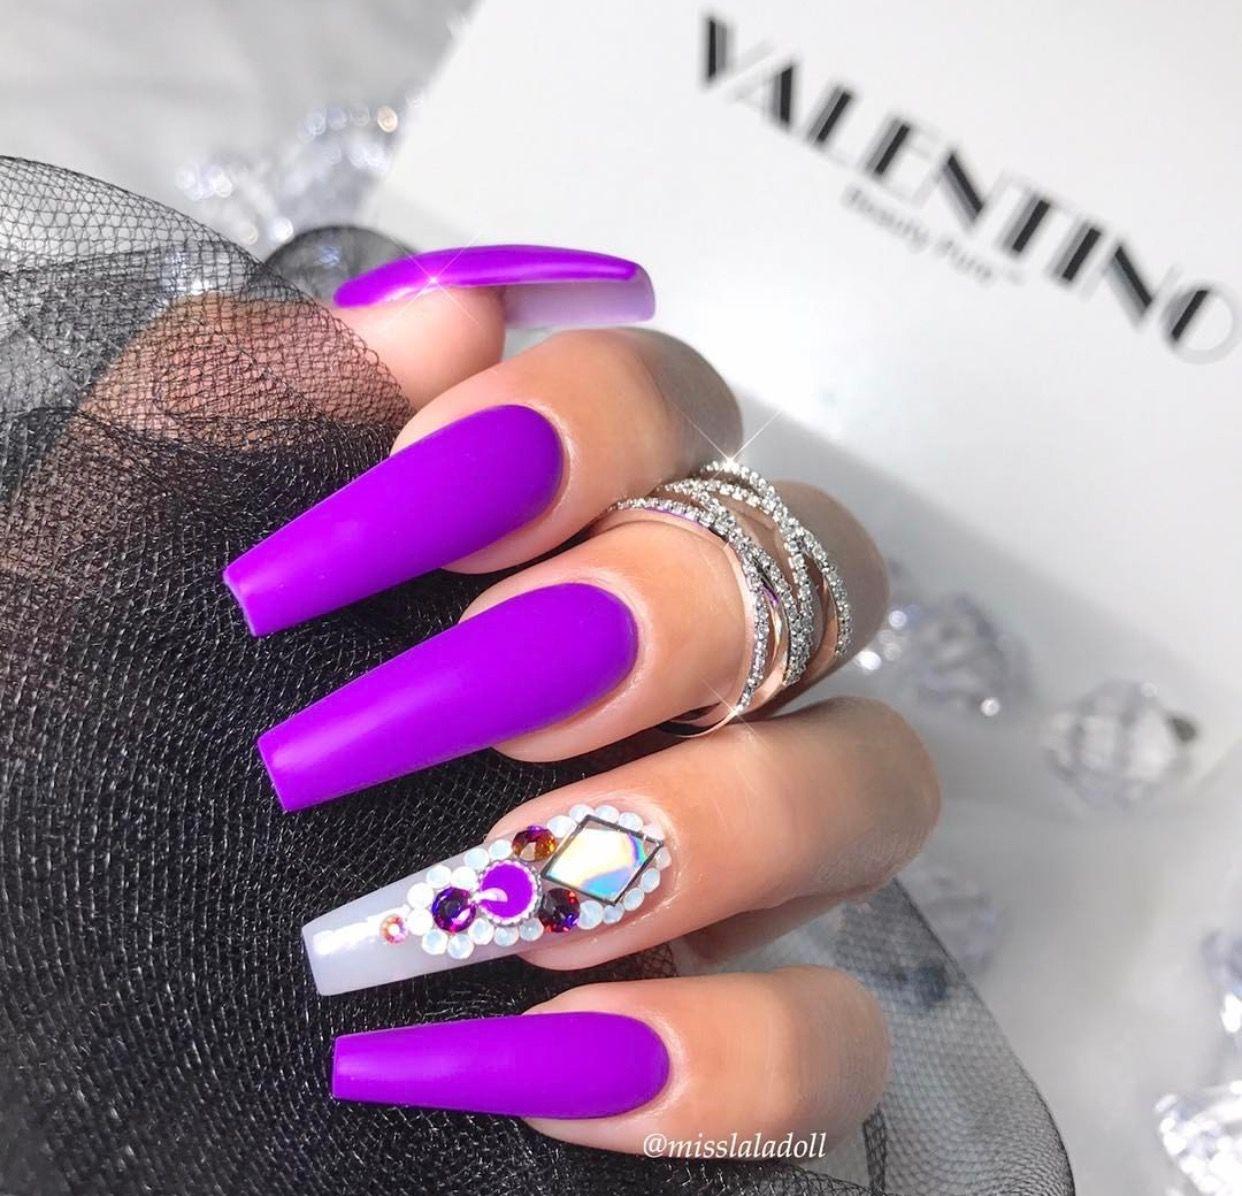 Pin by Dollhouse on N A I L S | Pinterest | Pinterest hair, Purple ...